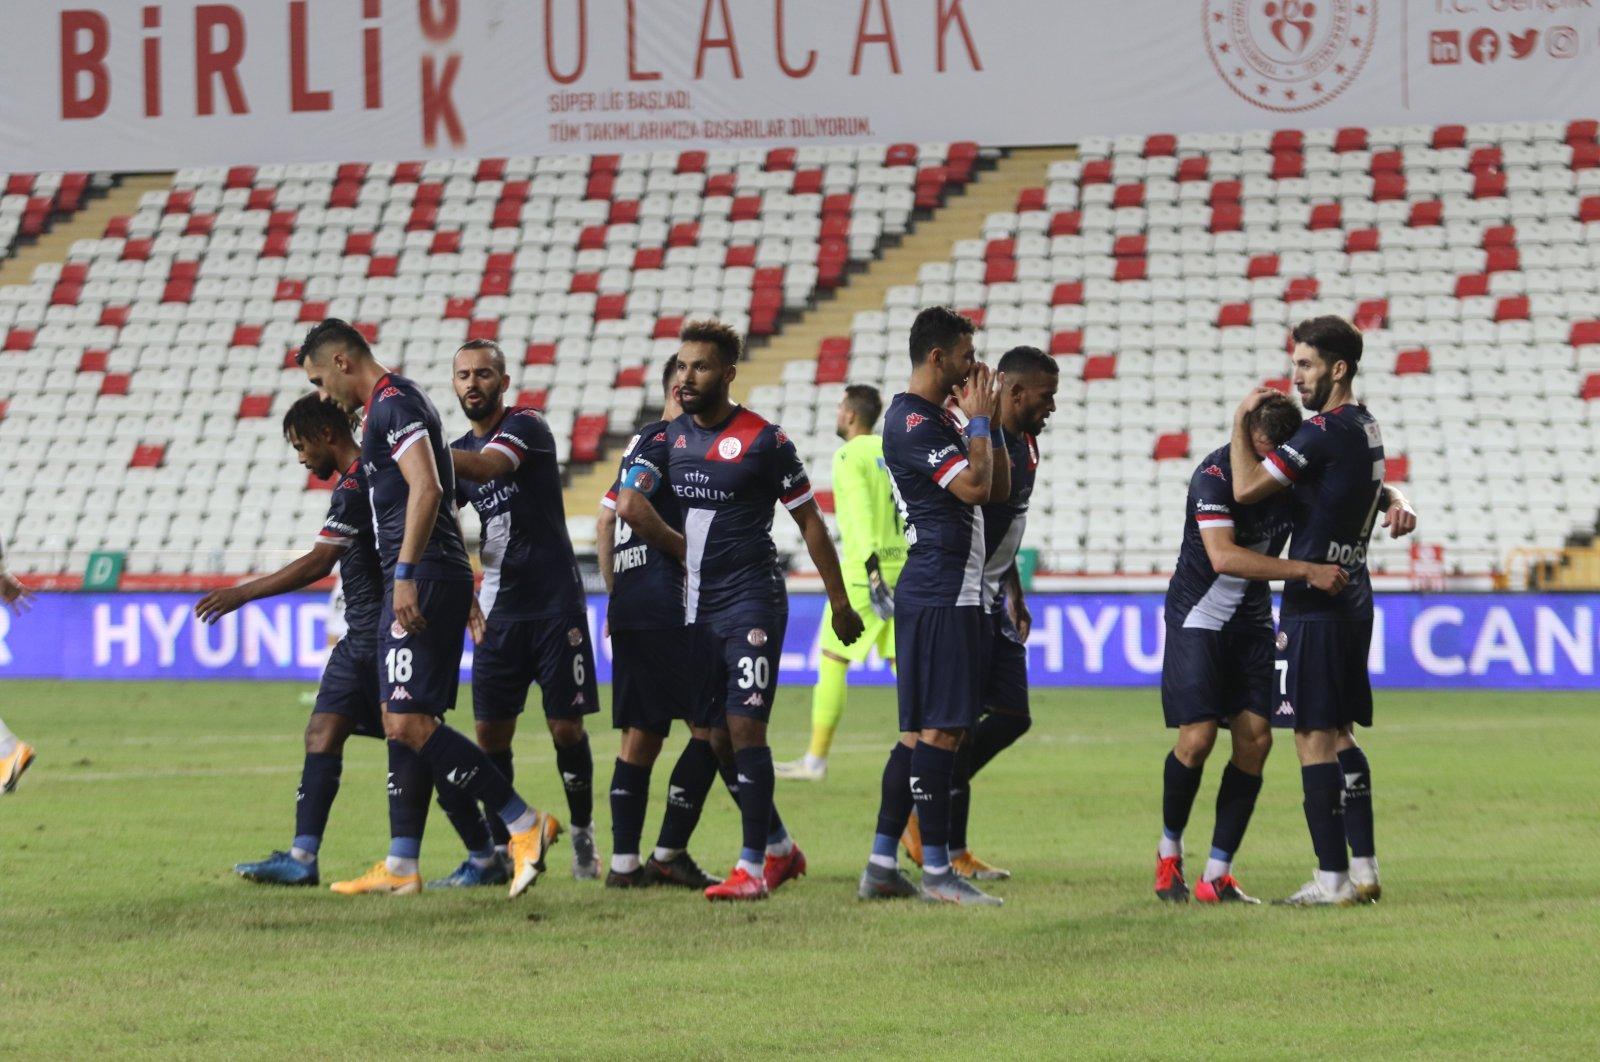 Antalyaspor players celebrate a goal during a Süper Lig match against Gençlerbirliği in Antalya, Turkey, Sept. 13, 2020. (IHA Photo)